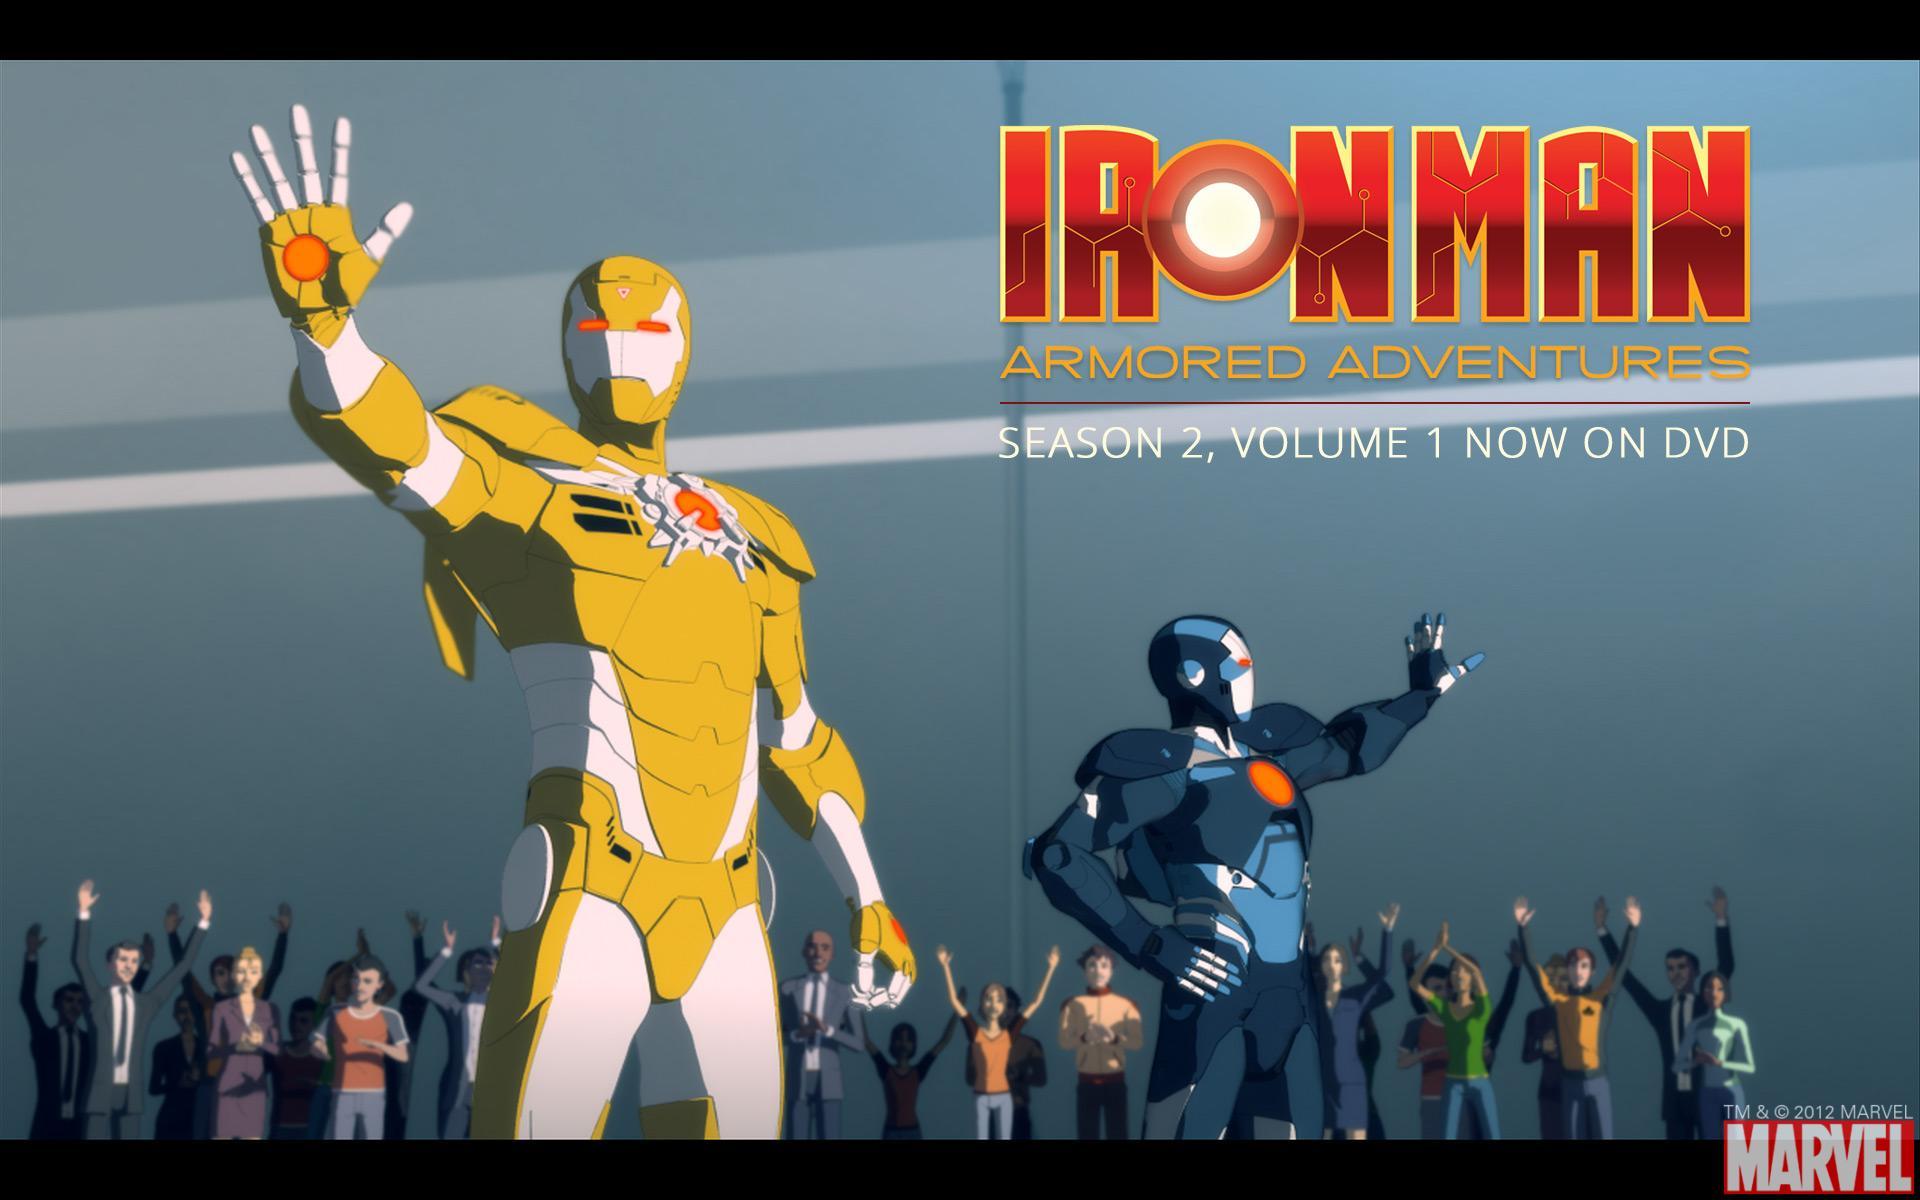 Iron Man Armored Adventures Stealth Armor Iron Man Armored Adventures